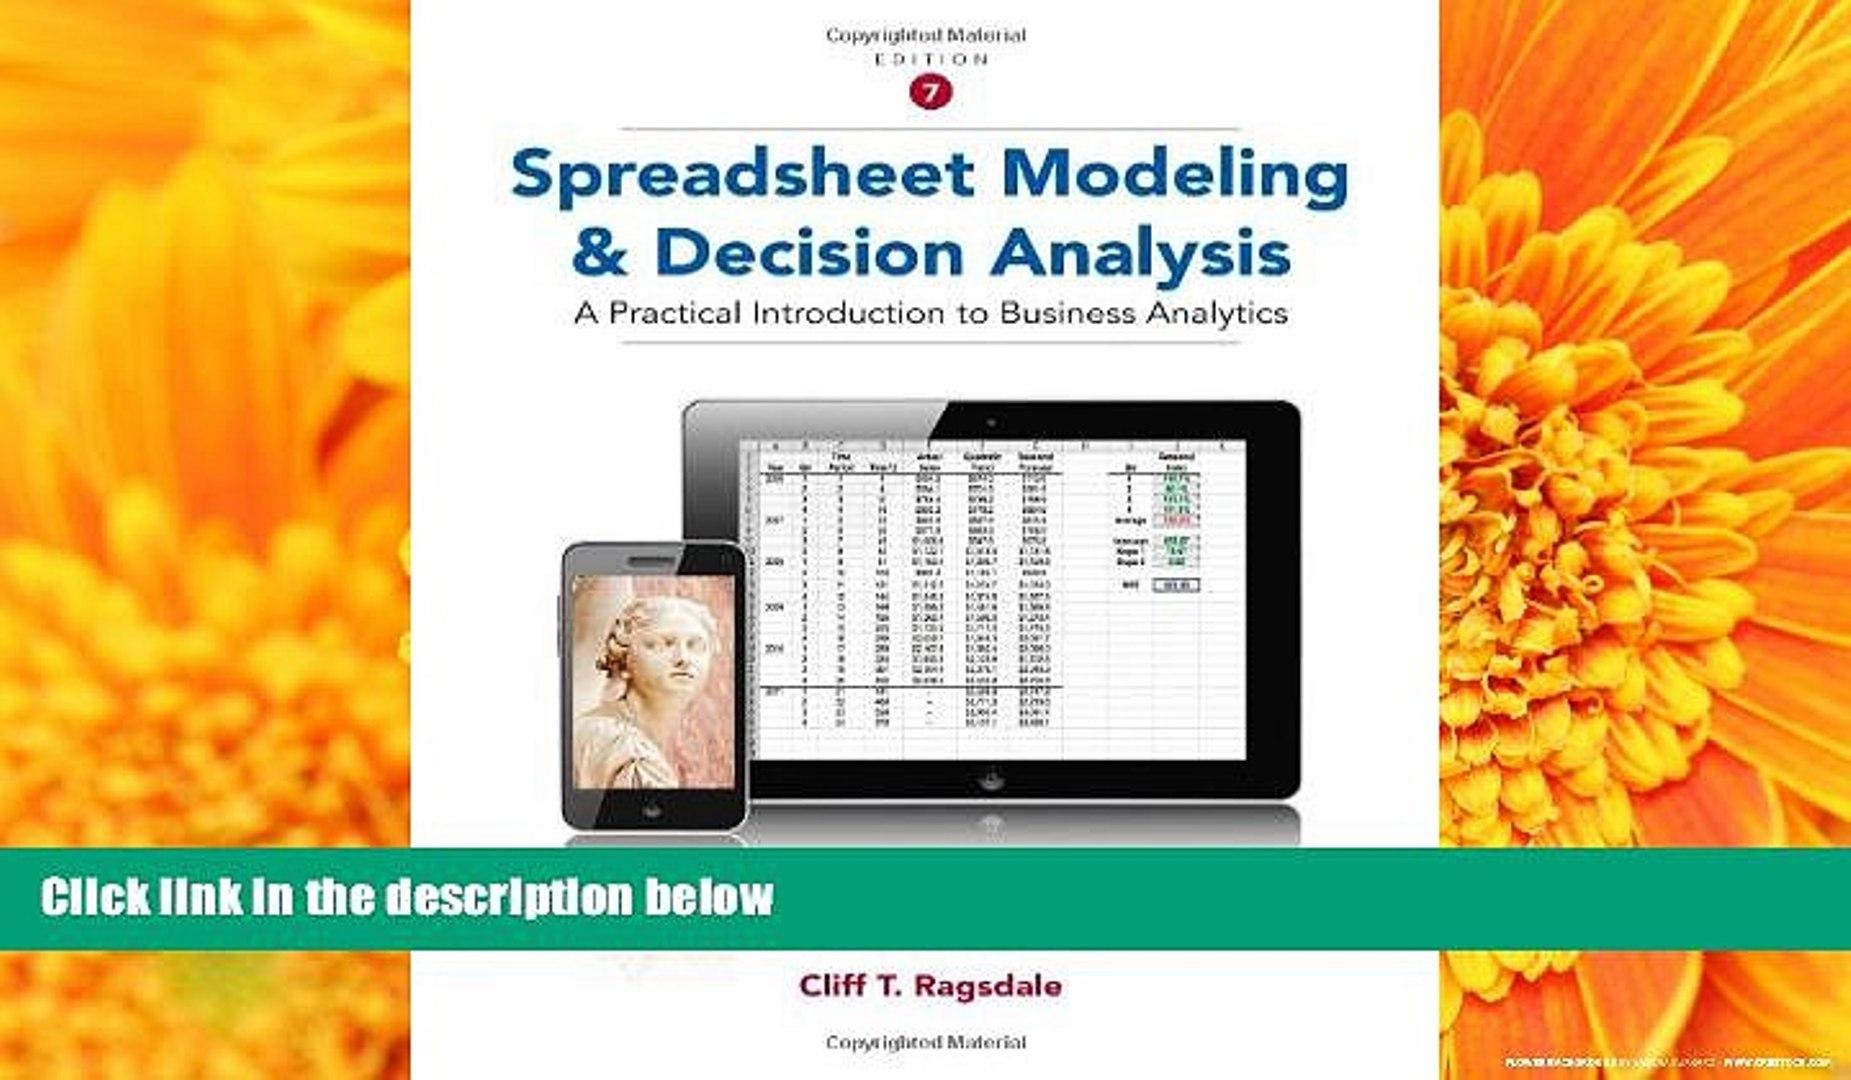 Ragsdale Spreadsheet Modeling pertaining to Pdf Spreadsheet Modeling And Decision Analysis: A Practical